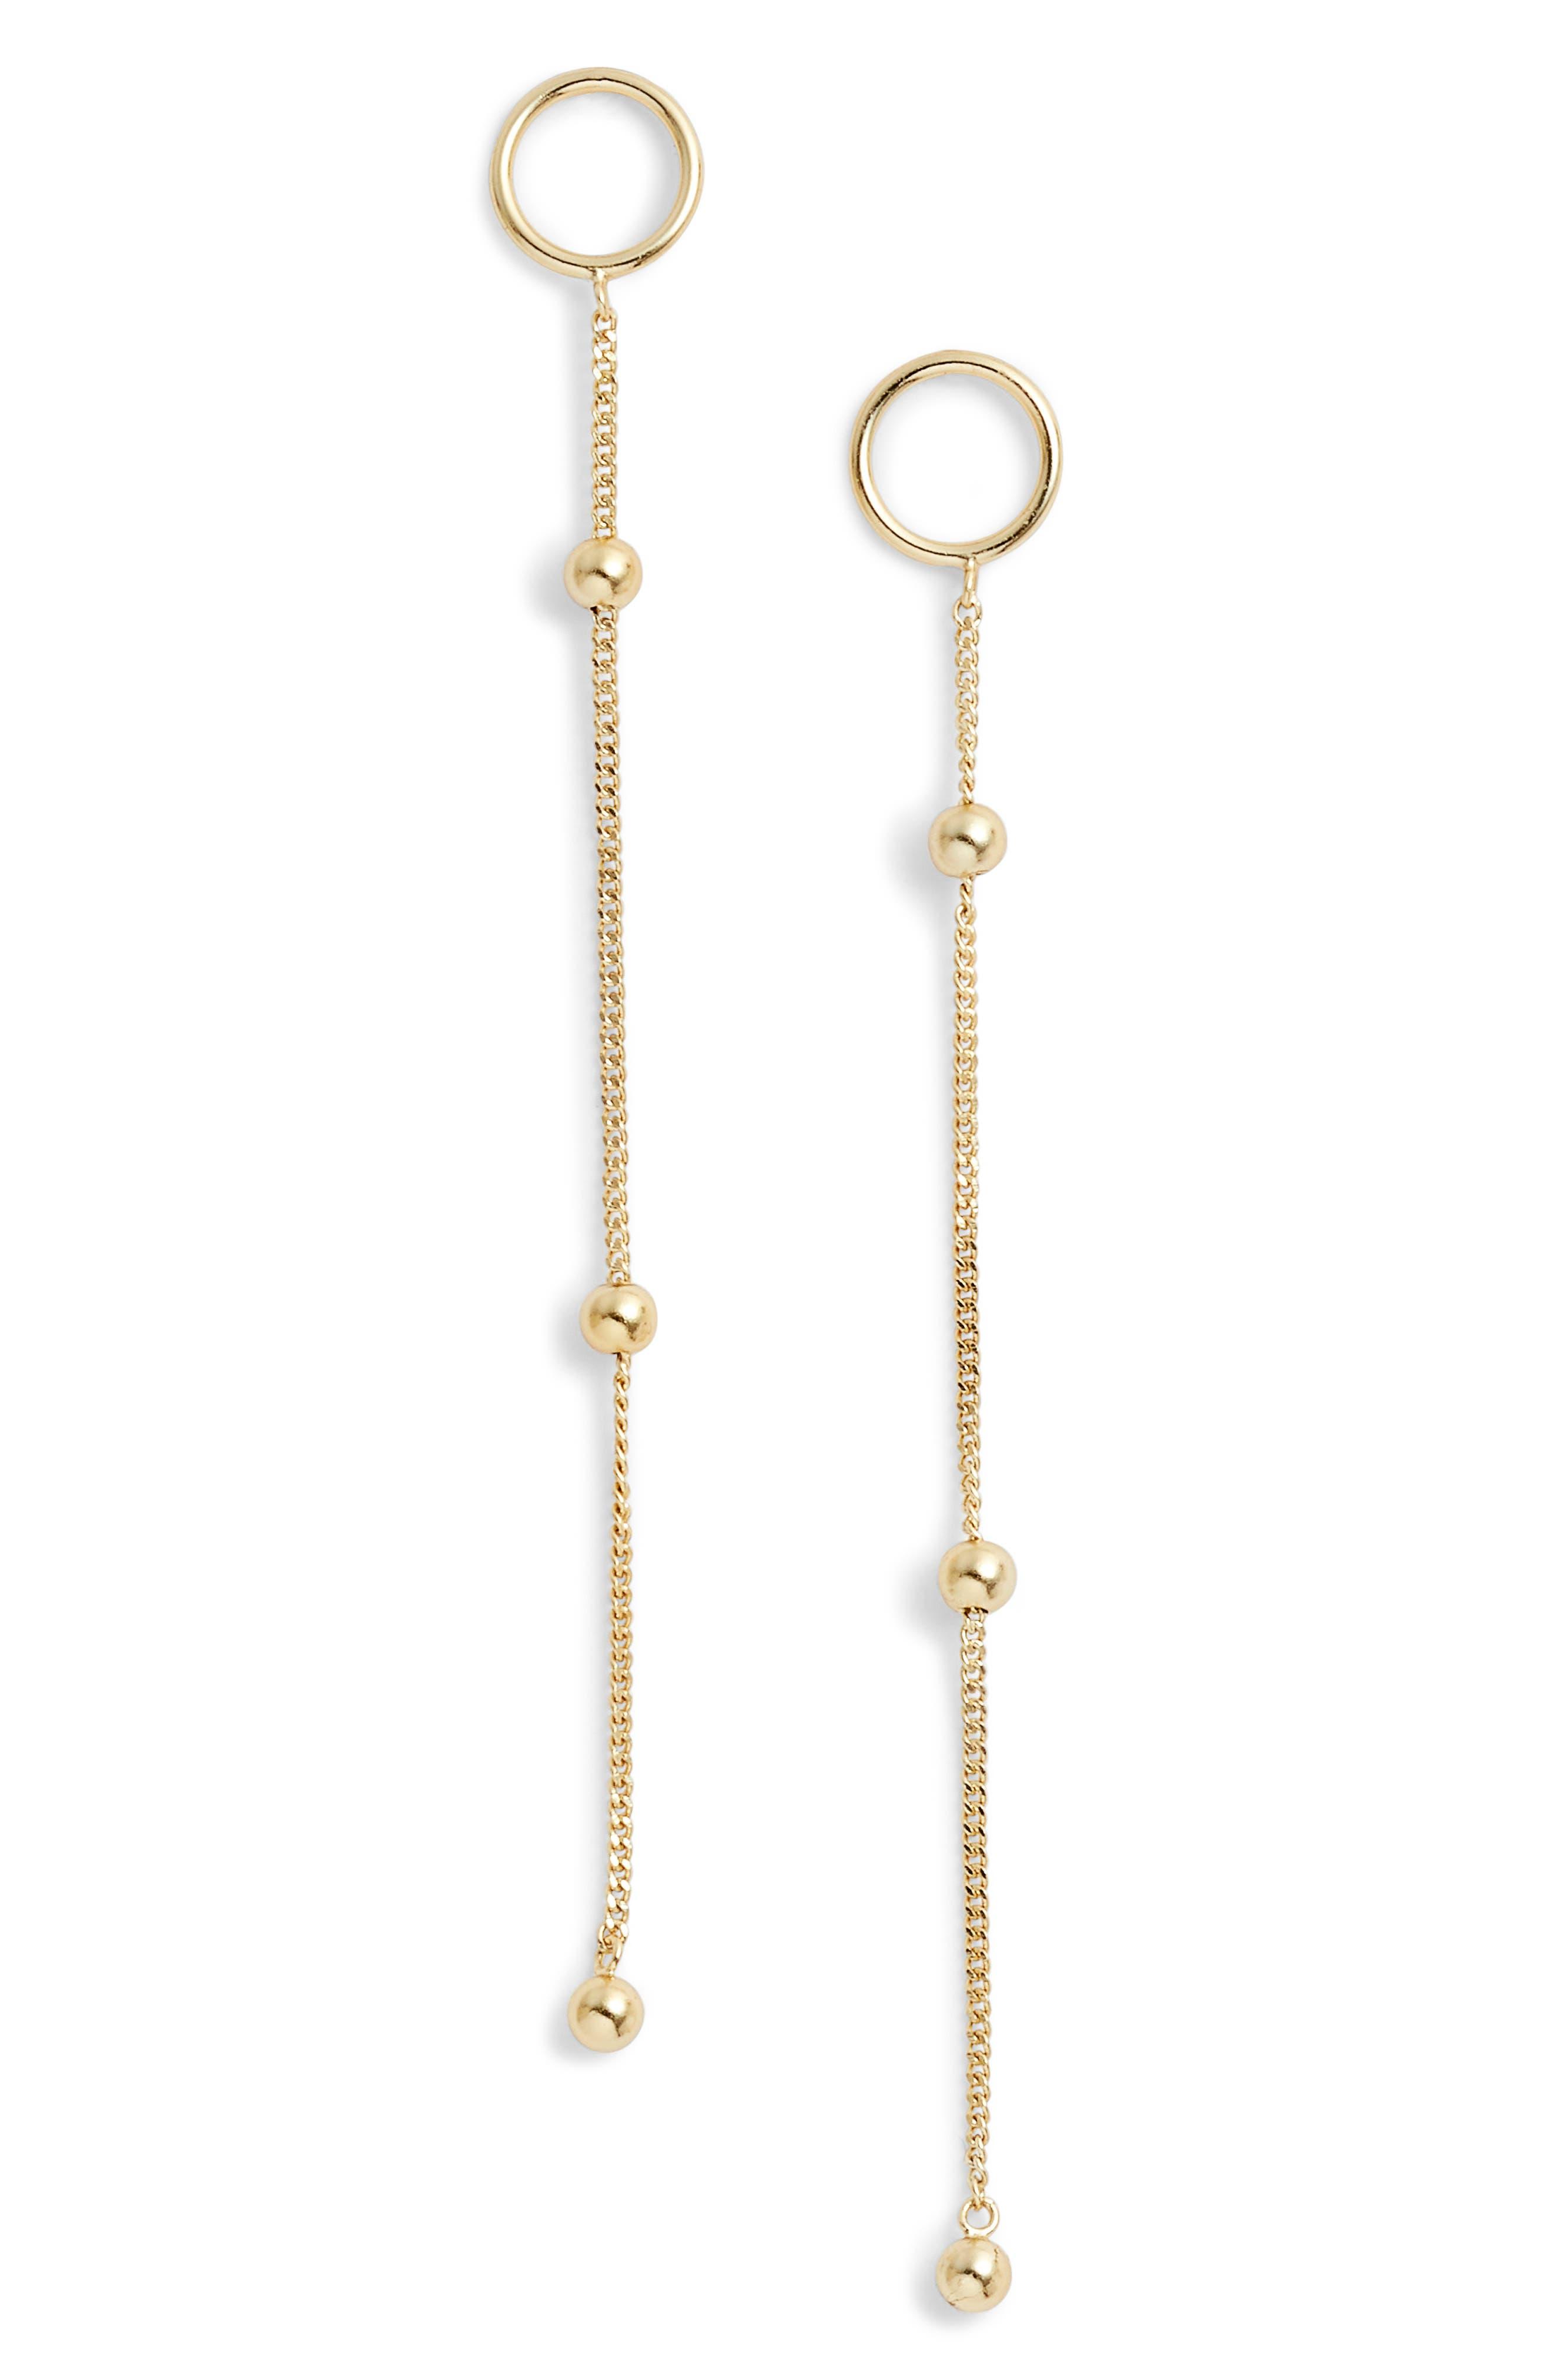 Alternate Image 1 Selected - Argento Vivo Ava Ball Chain Drop Earrings